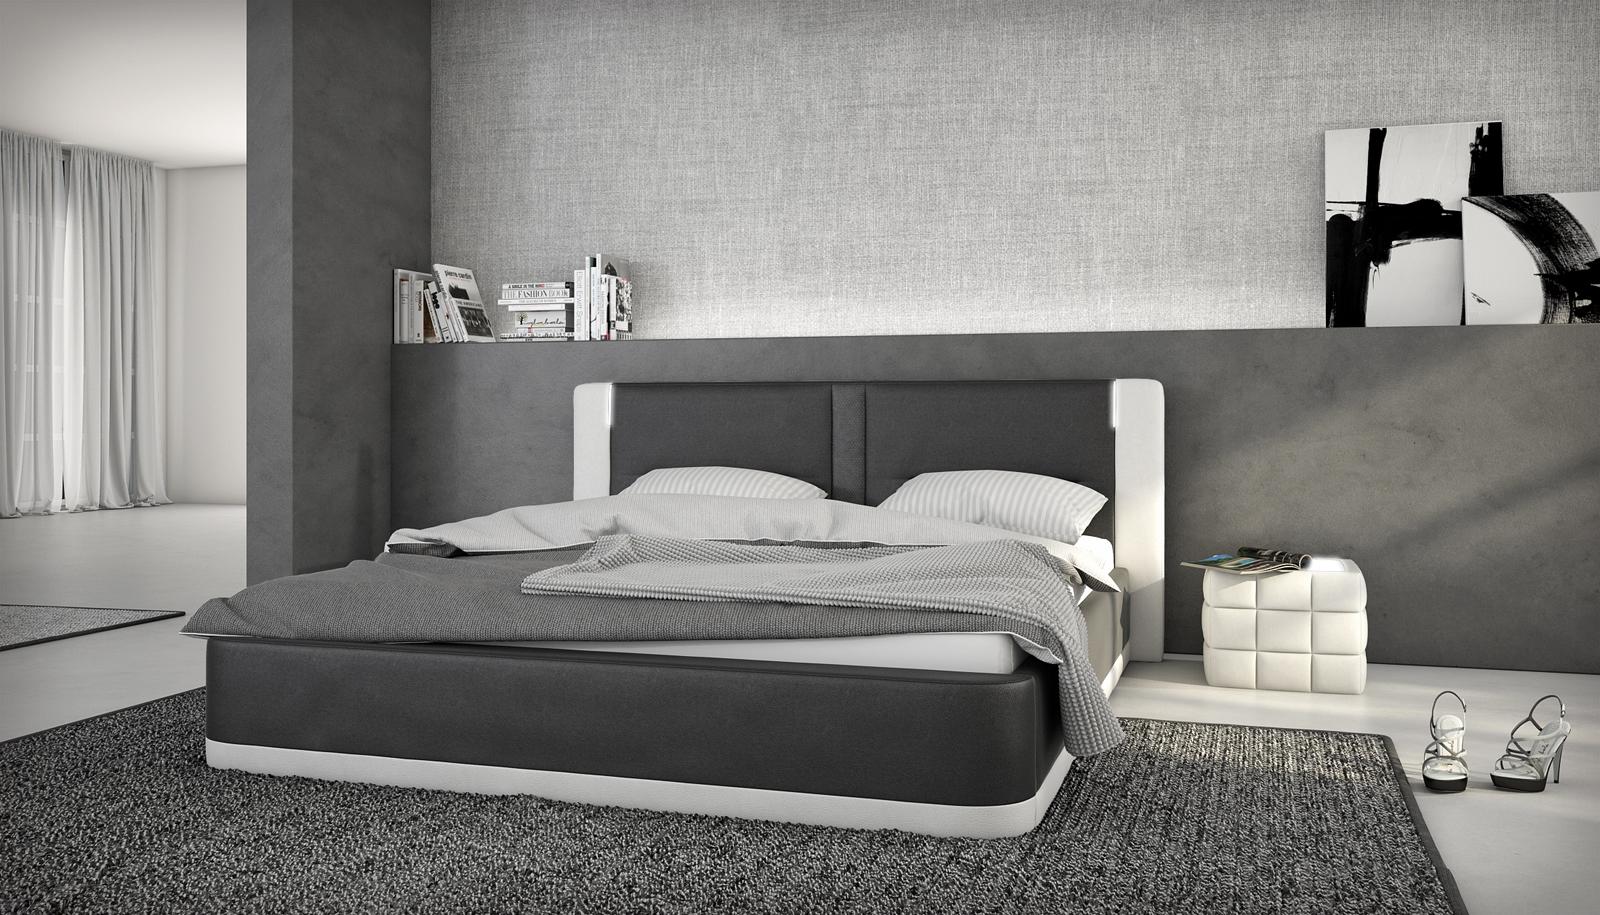 sam polsterbett 180 x 200 cm soundsystem schwarz wei rayanda. Black Bedroom Furniture Sets. Home Design Ideas